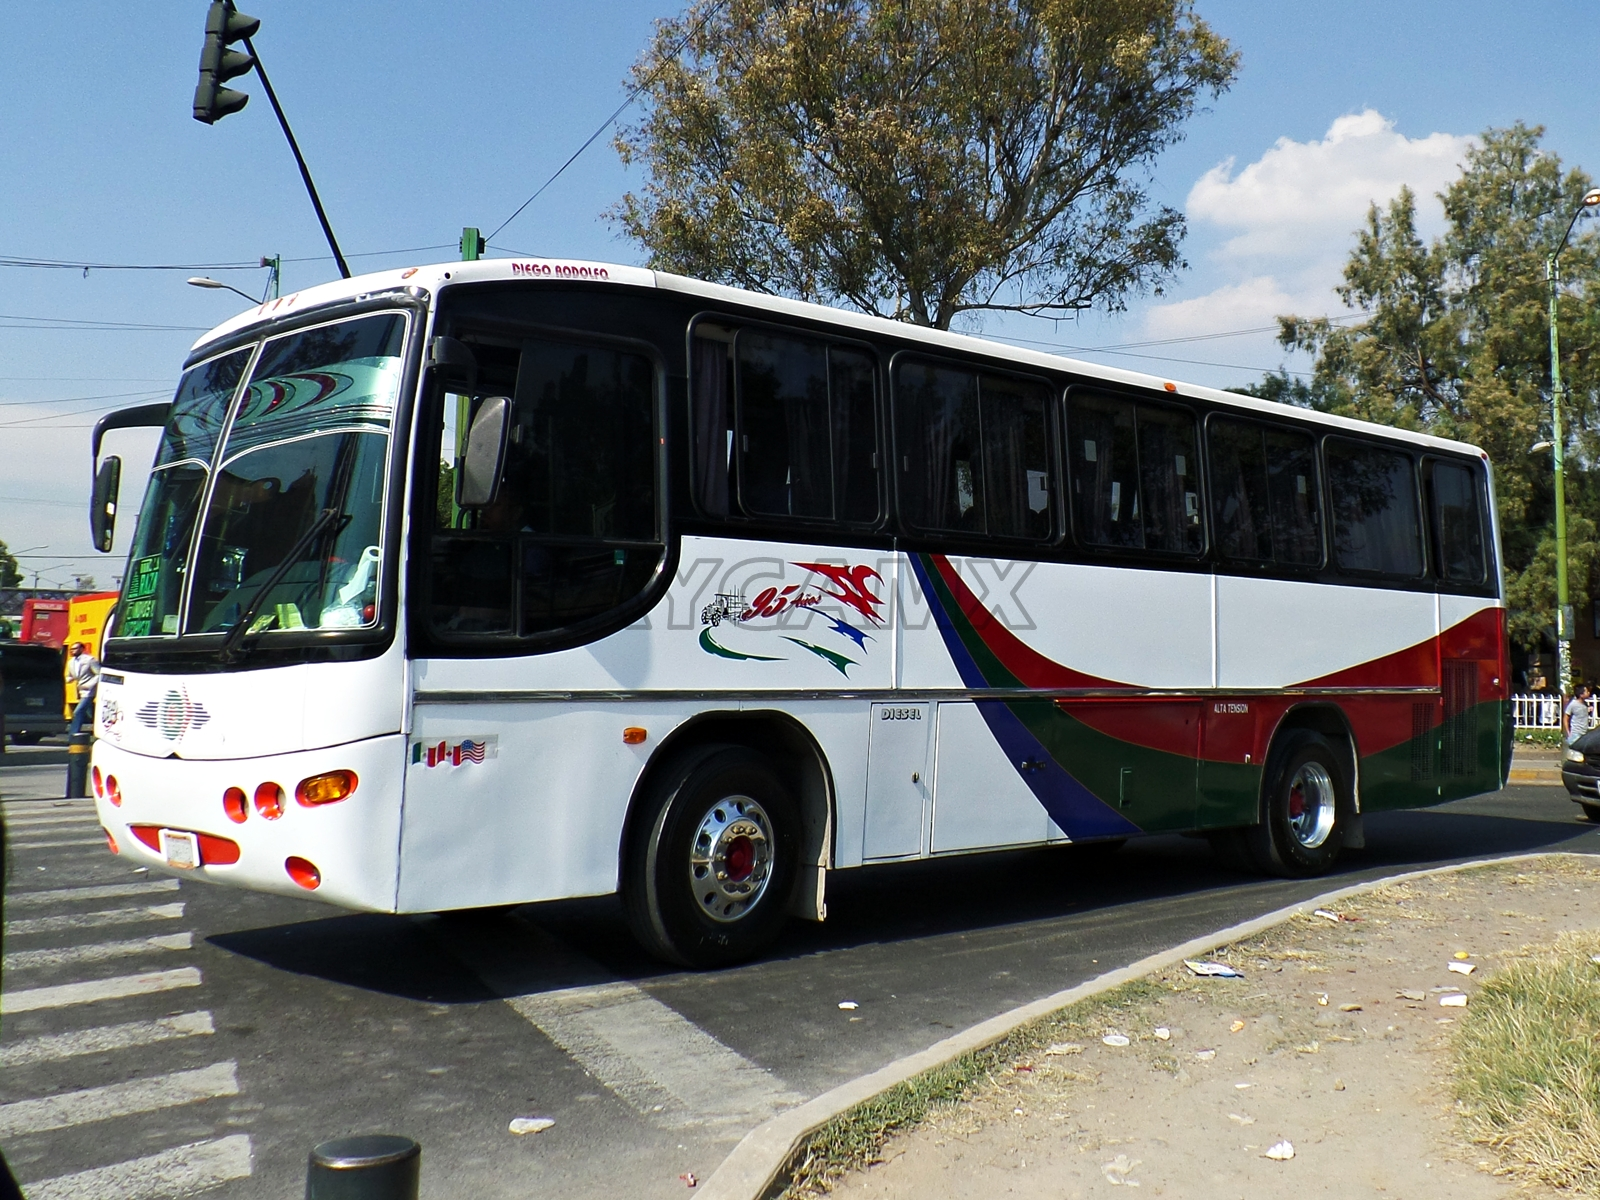 Aycamx autobuses y camiones m xico autobuses for neos for Mercedes benz san pedro